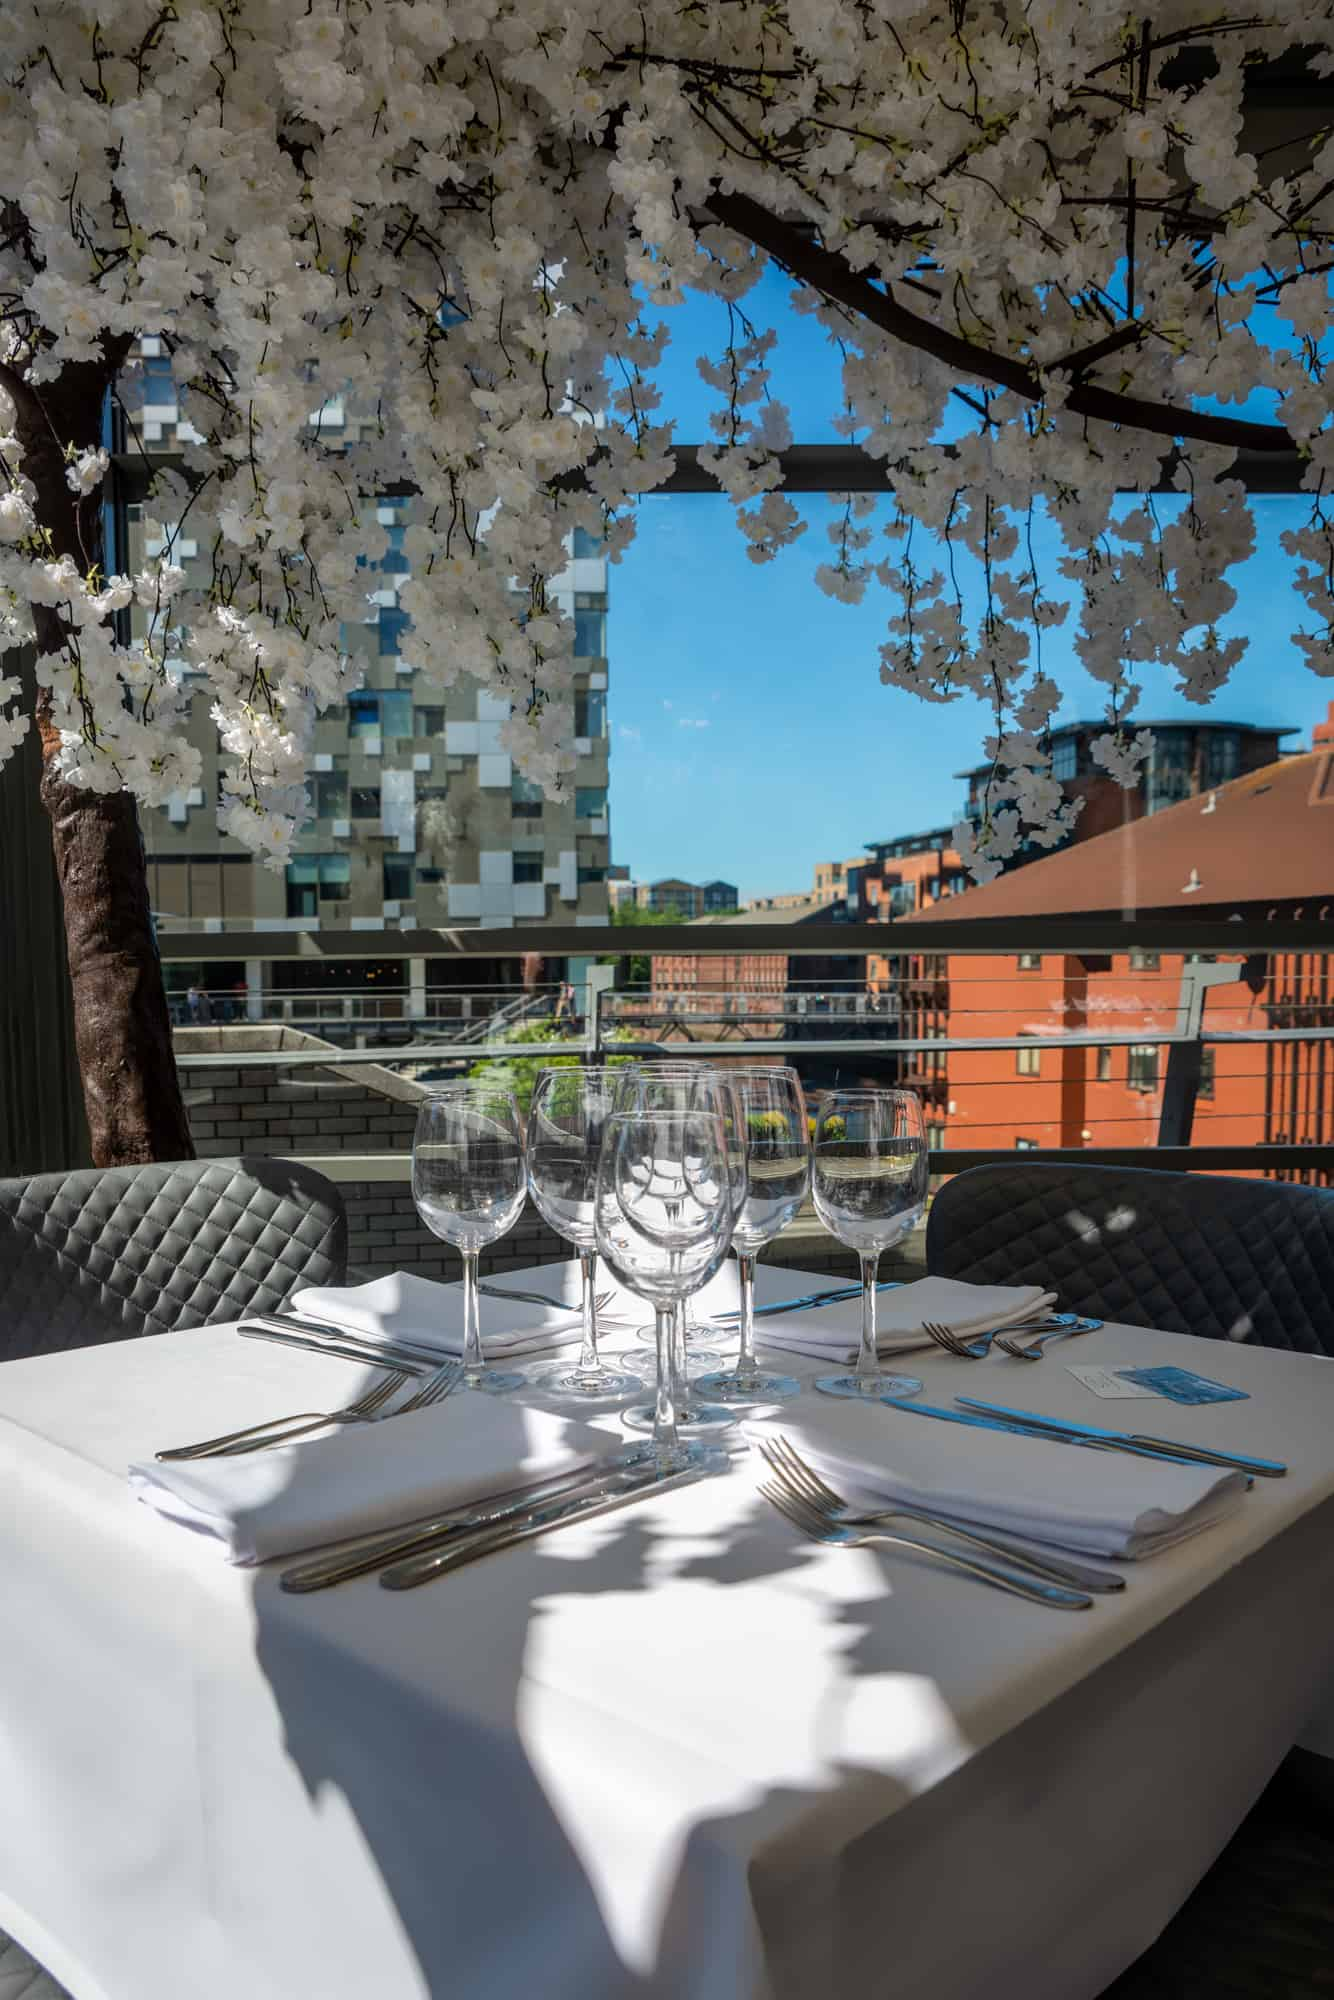 Lucarelli restaurant, view. pergola, grand union canal